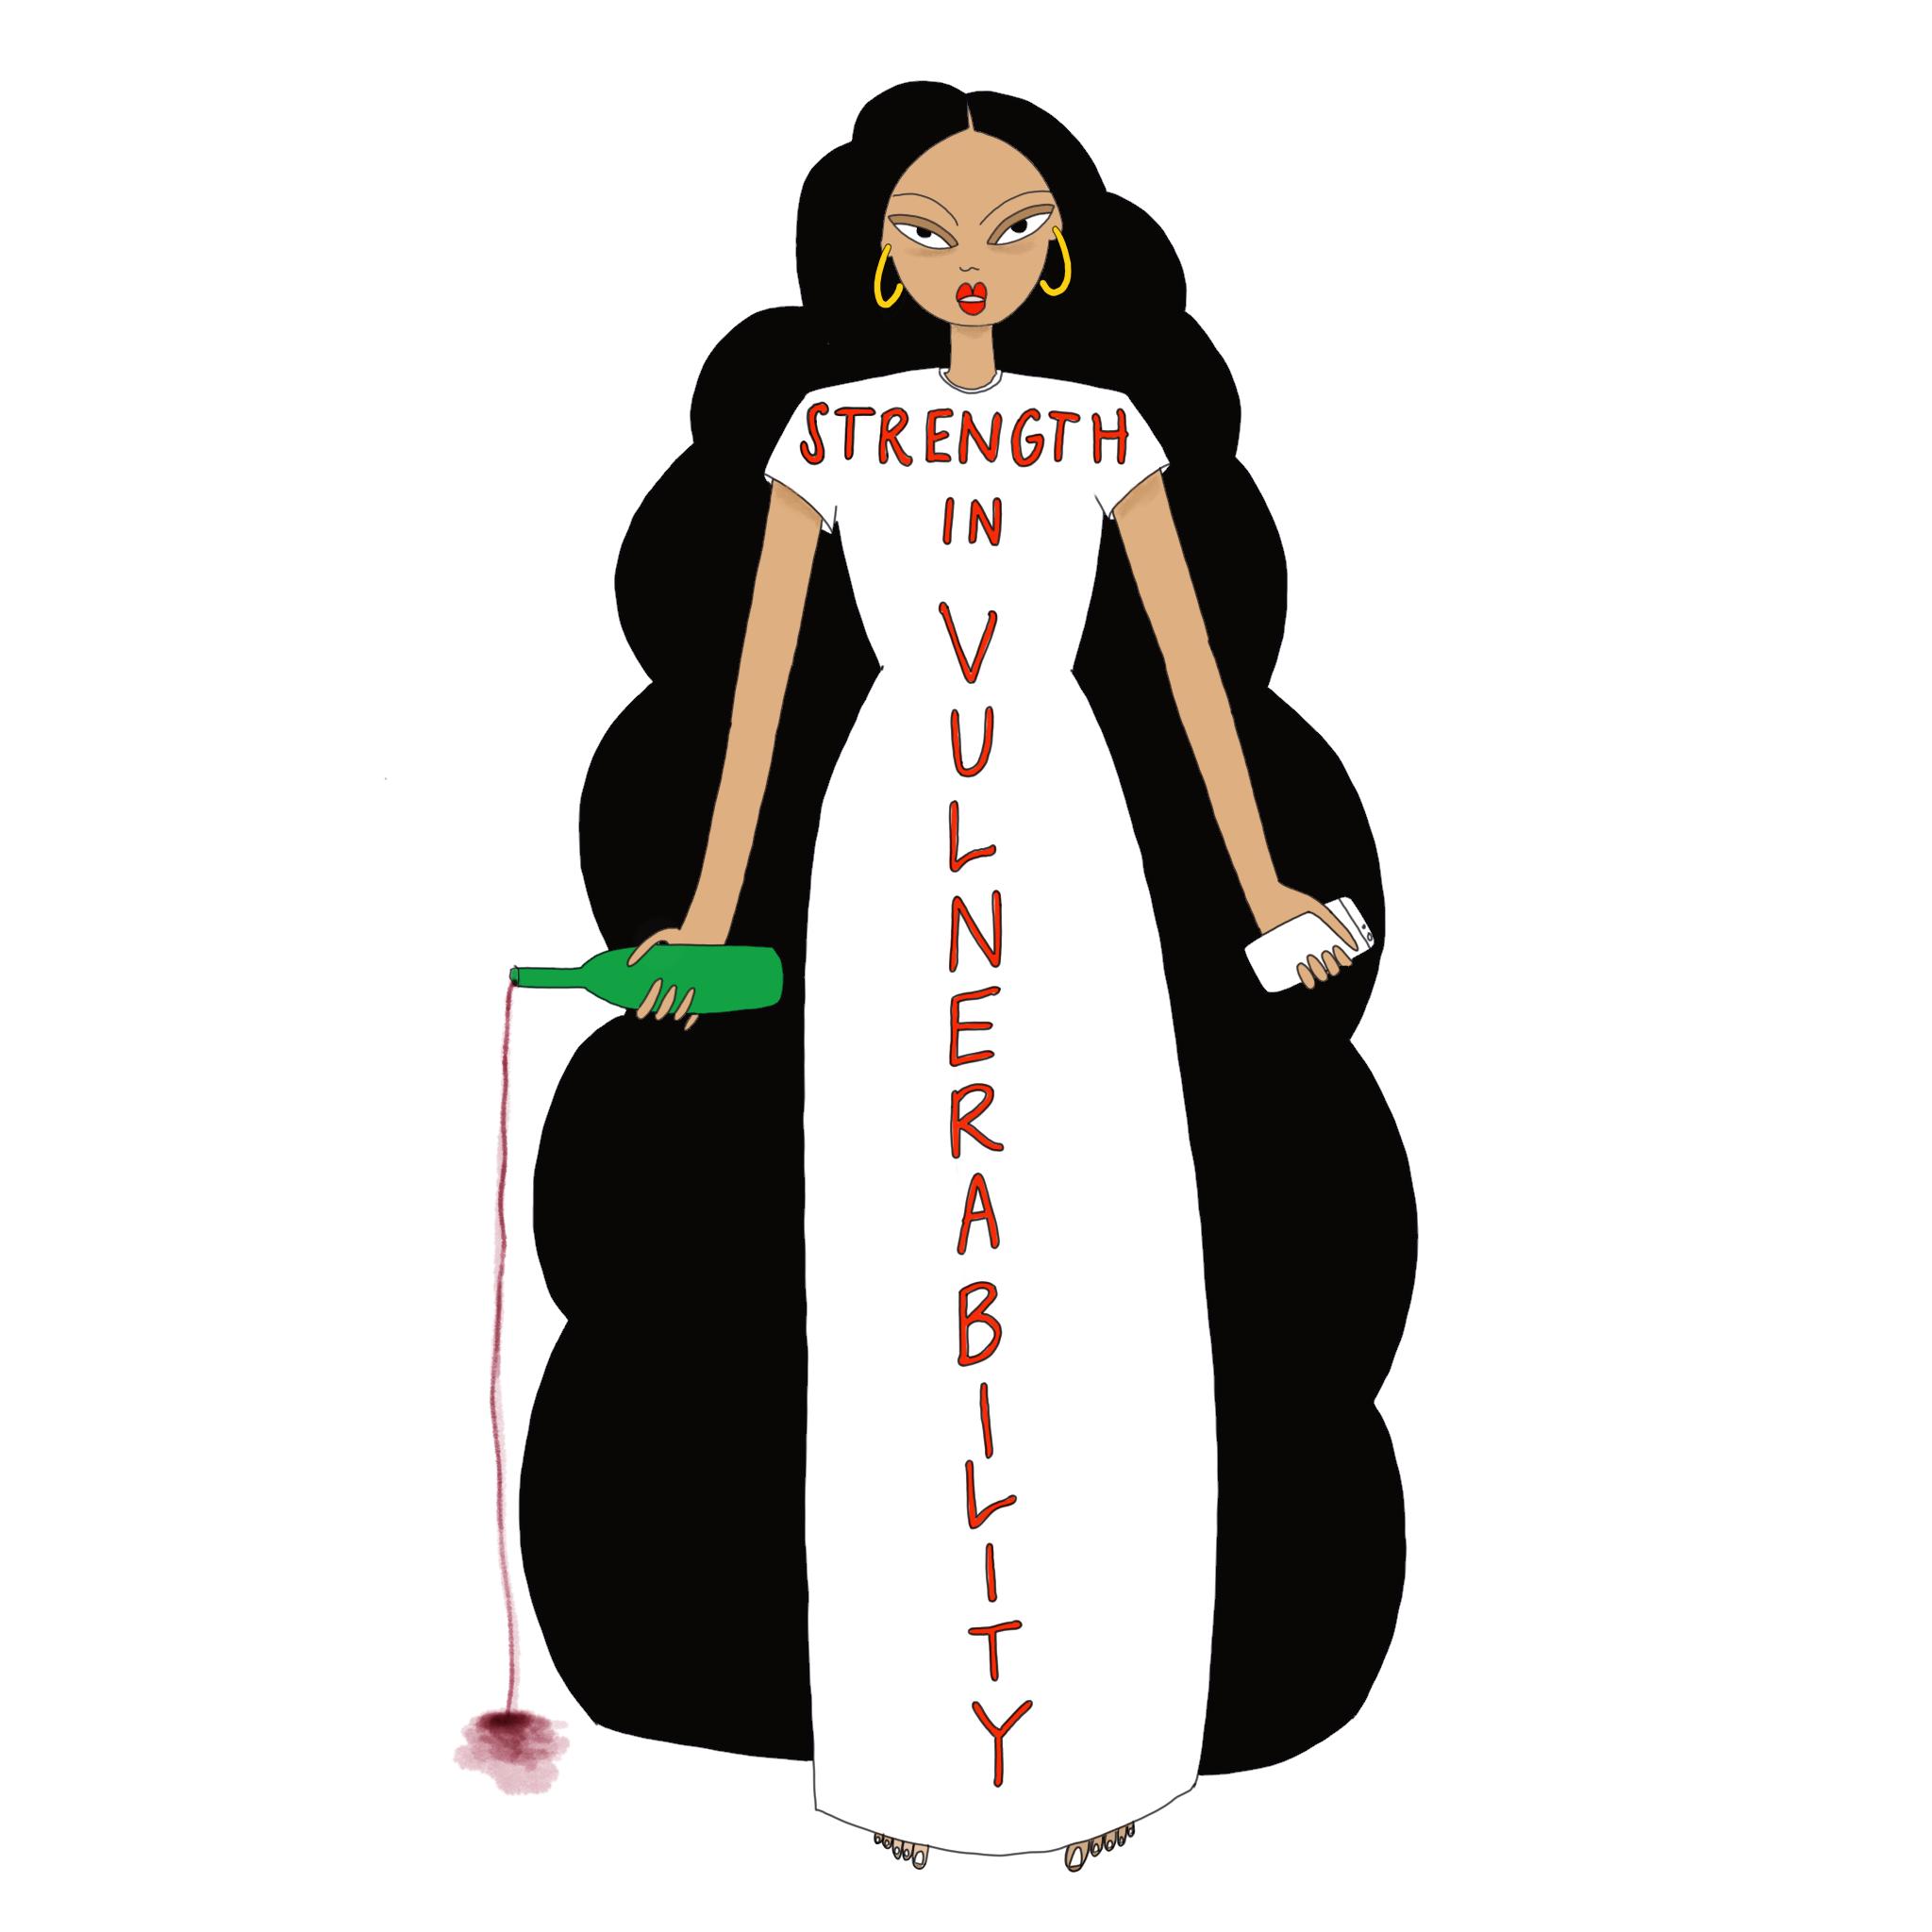 Emma Allegretti - Vulnerability (courtesy of the artist)